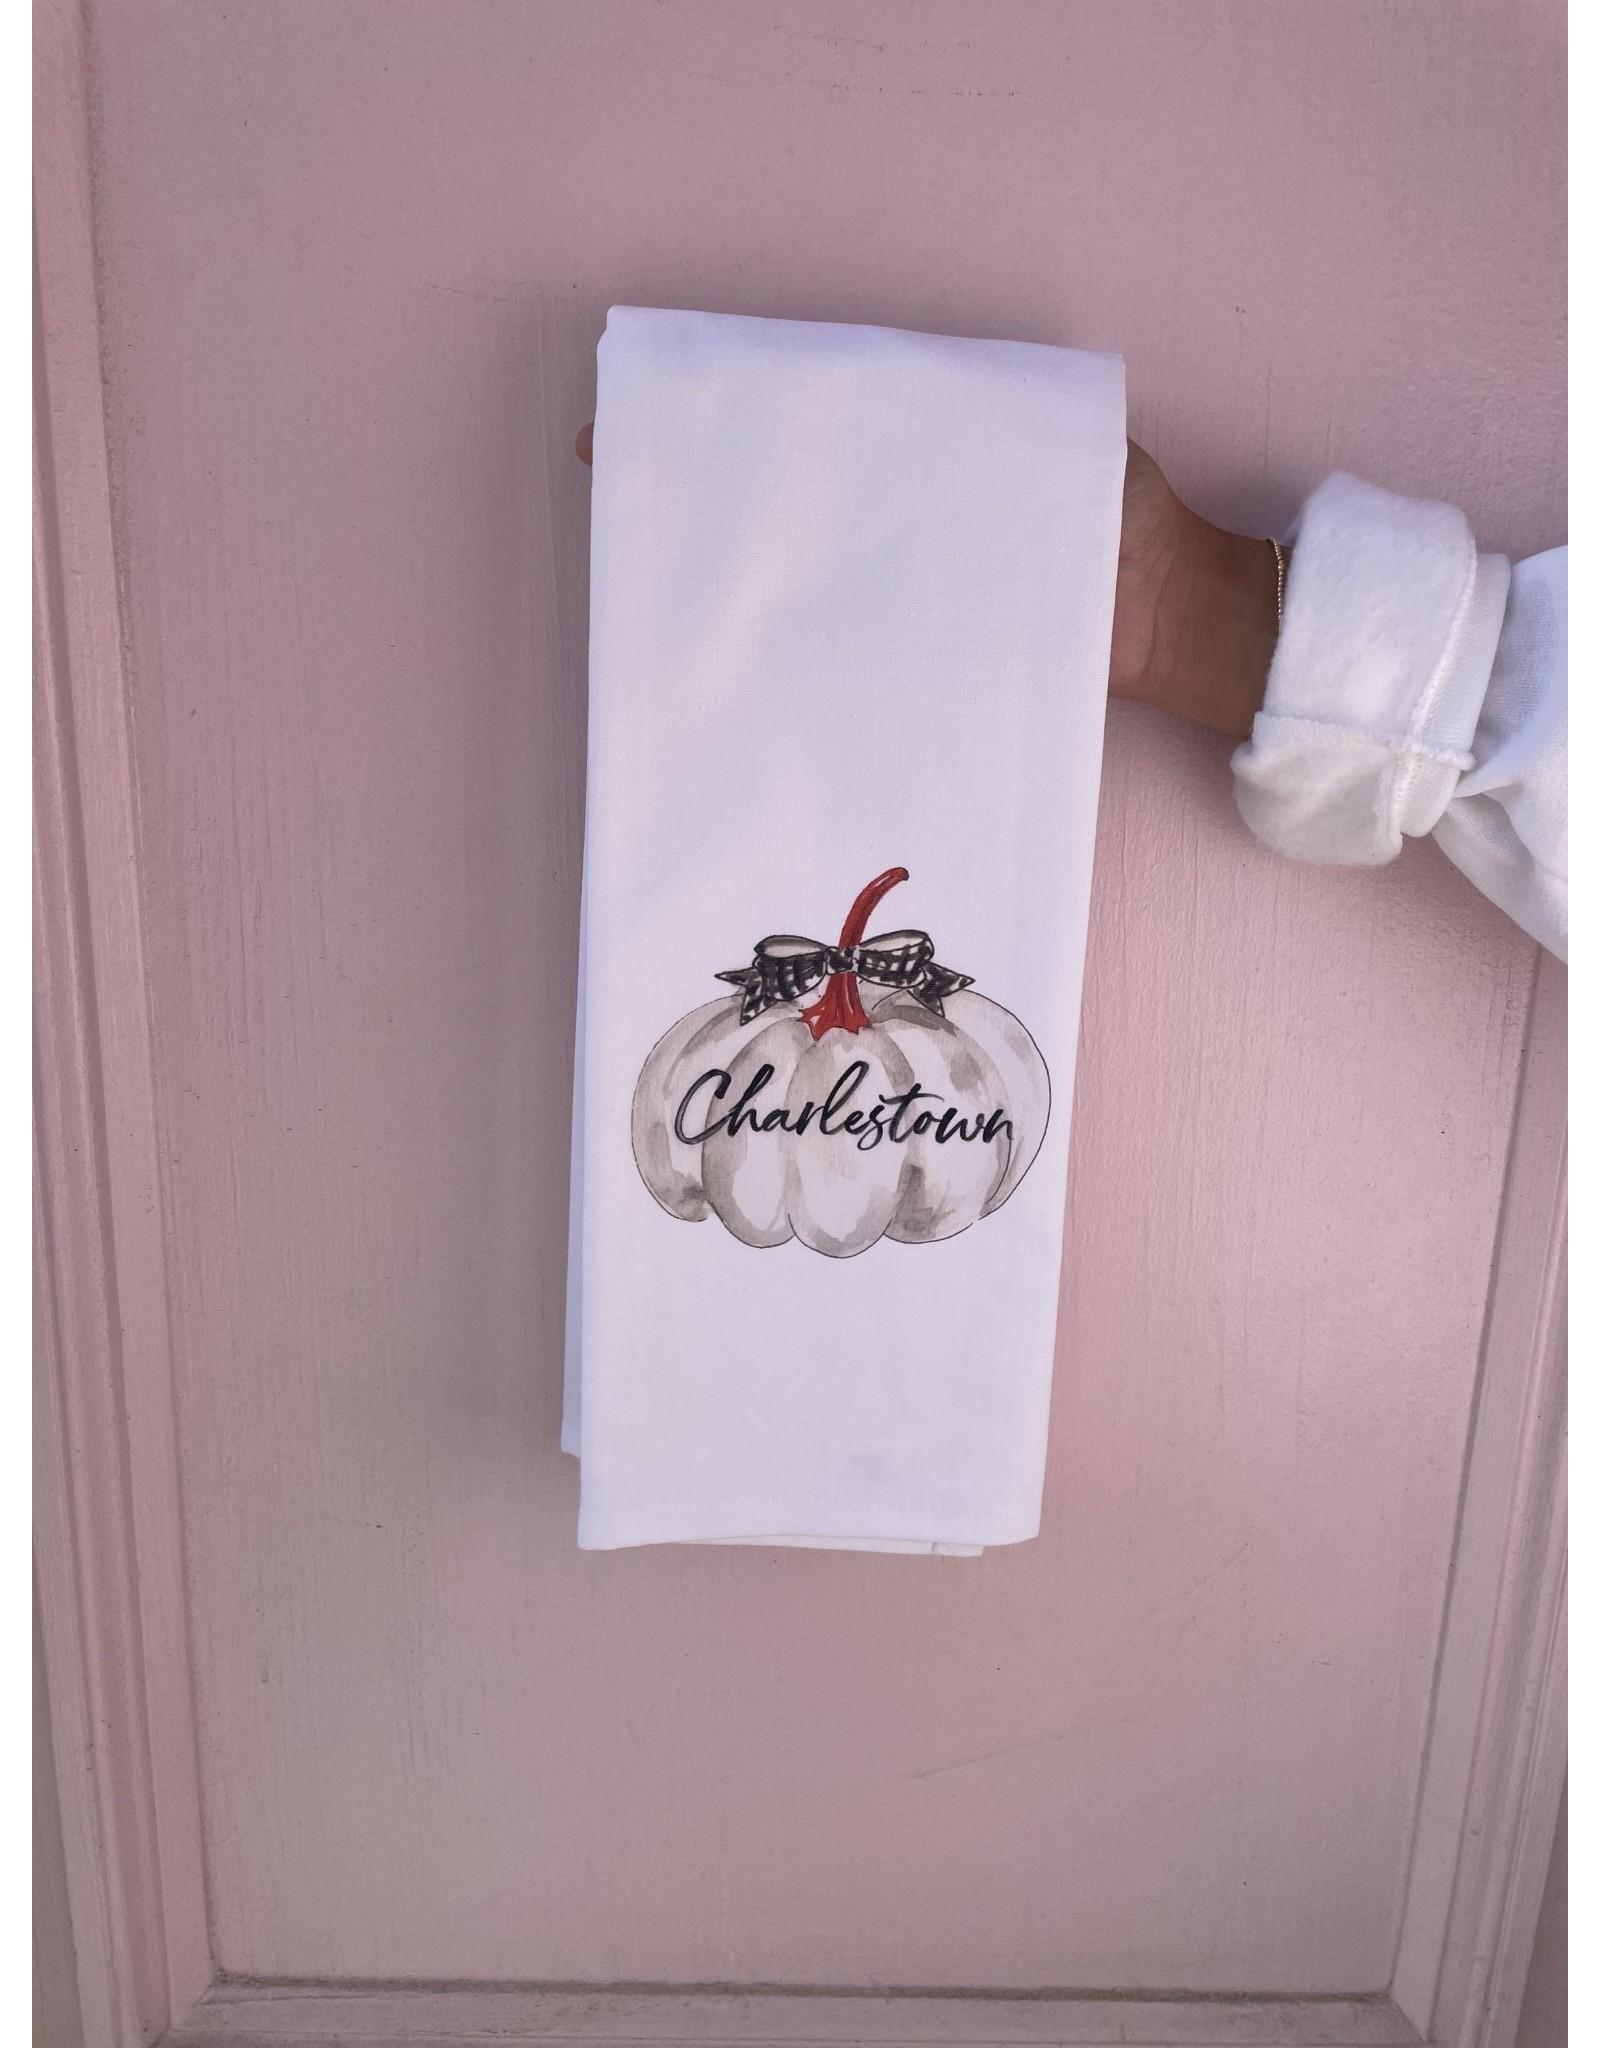 RoseanneBECK Collection White Pumpkin Charlestown Tea Towel